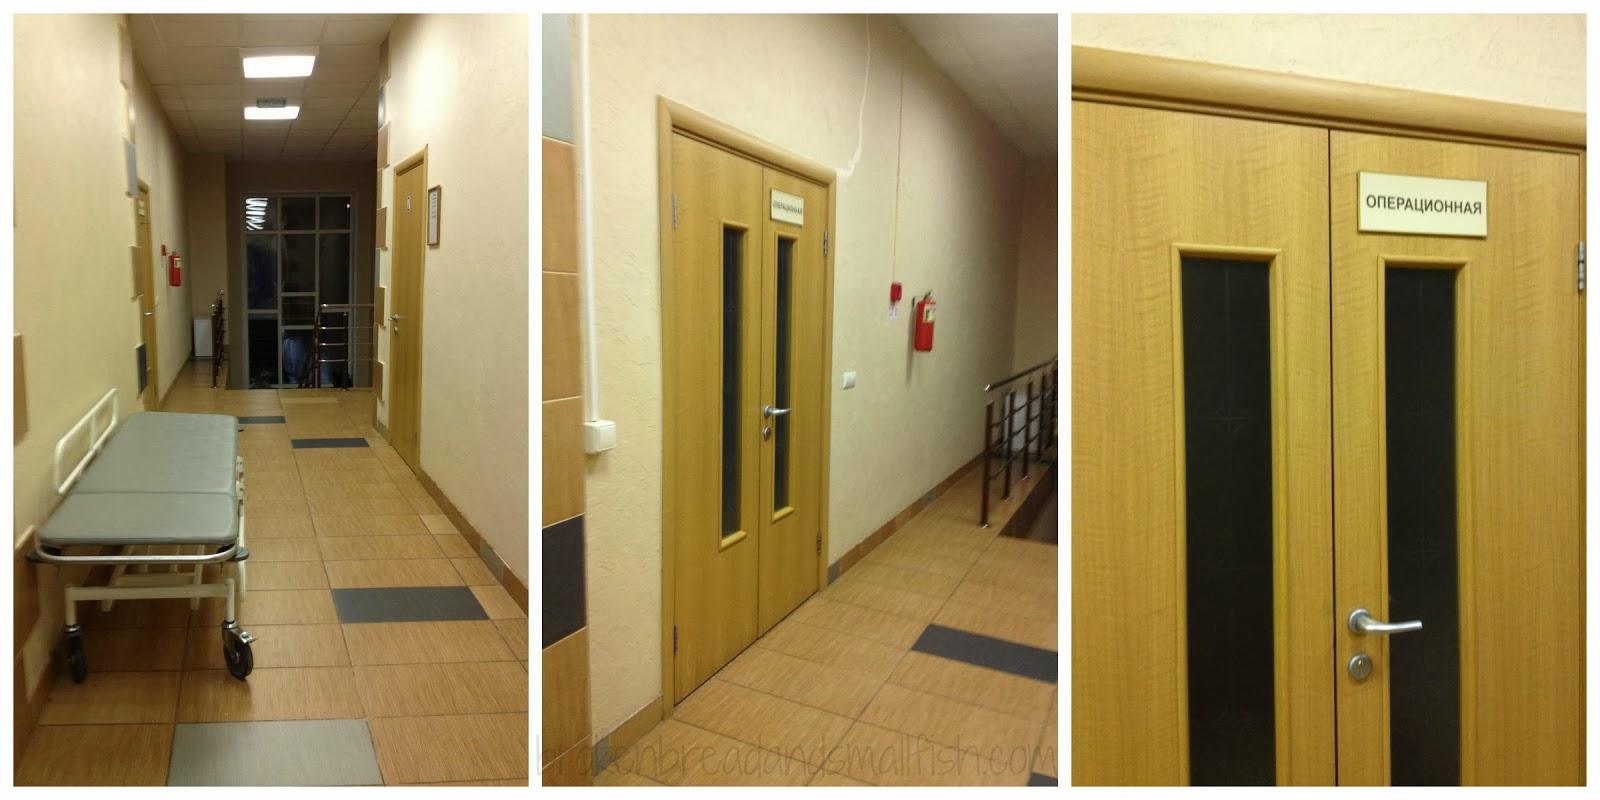 Operating Room Doors - My Hysterectomy in Siberia Part 4